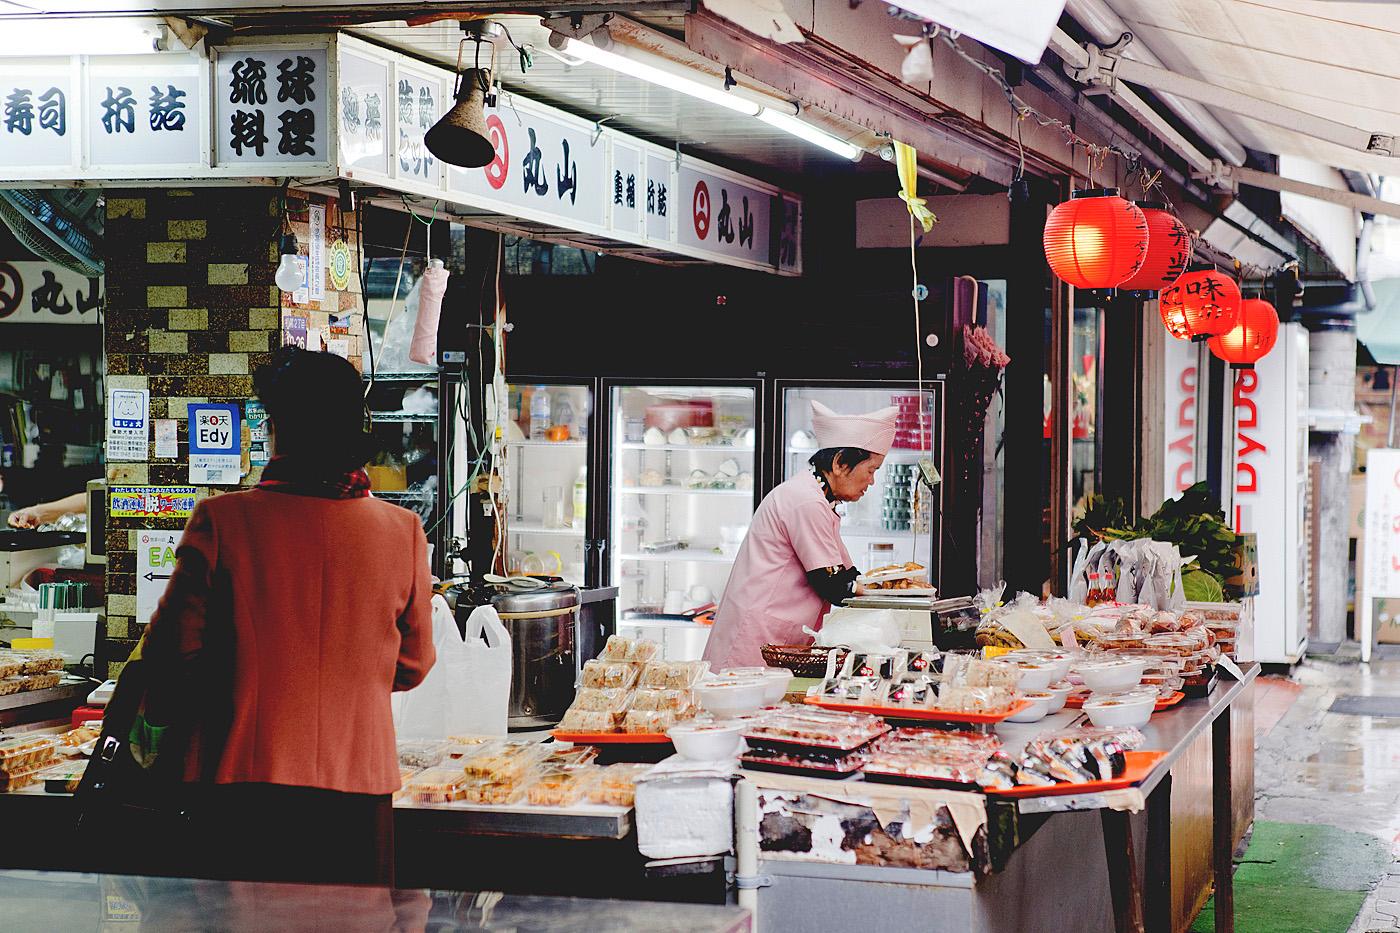 The golden bun - naha market naha, okinawa market, makishi market, naha city okinawa - okinawa fish market guide